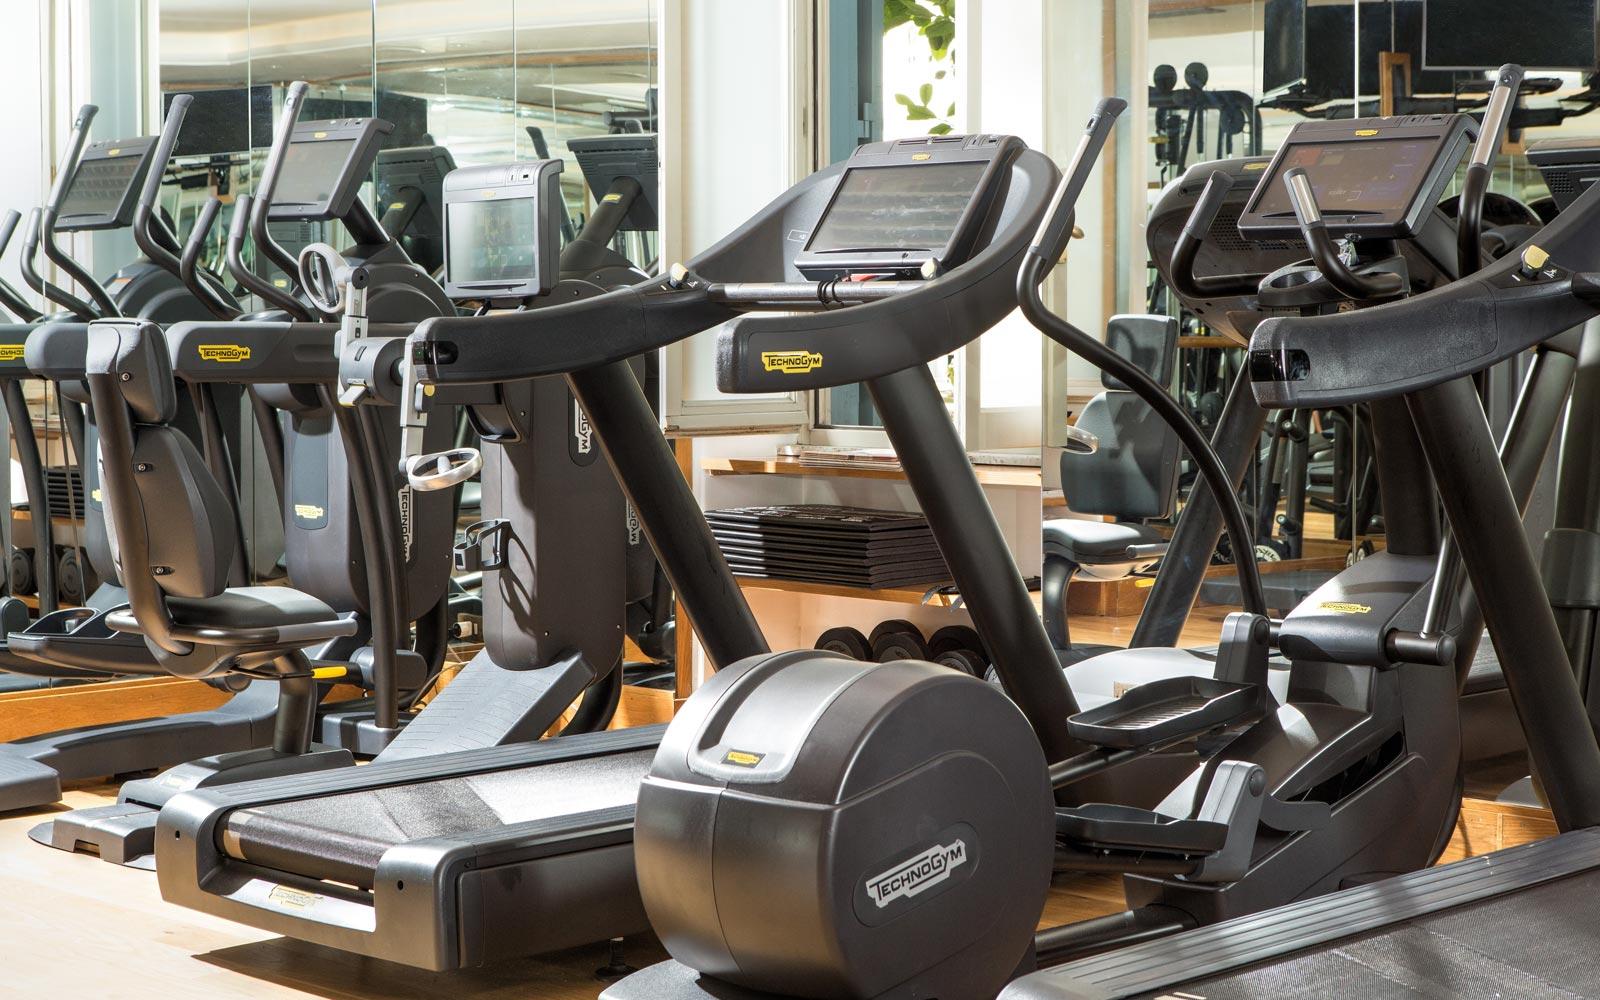 Hotel de Russie Gym